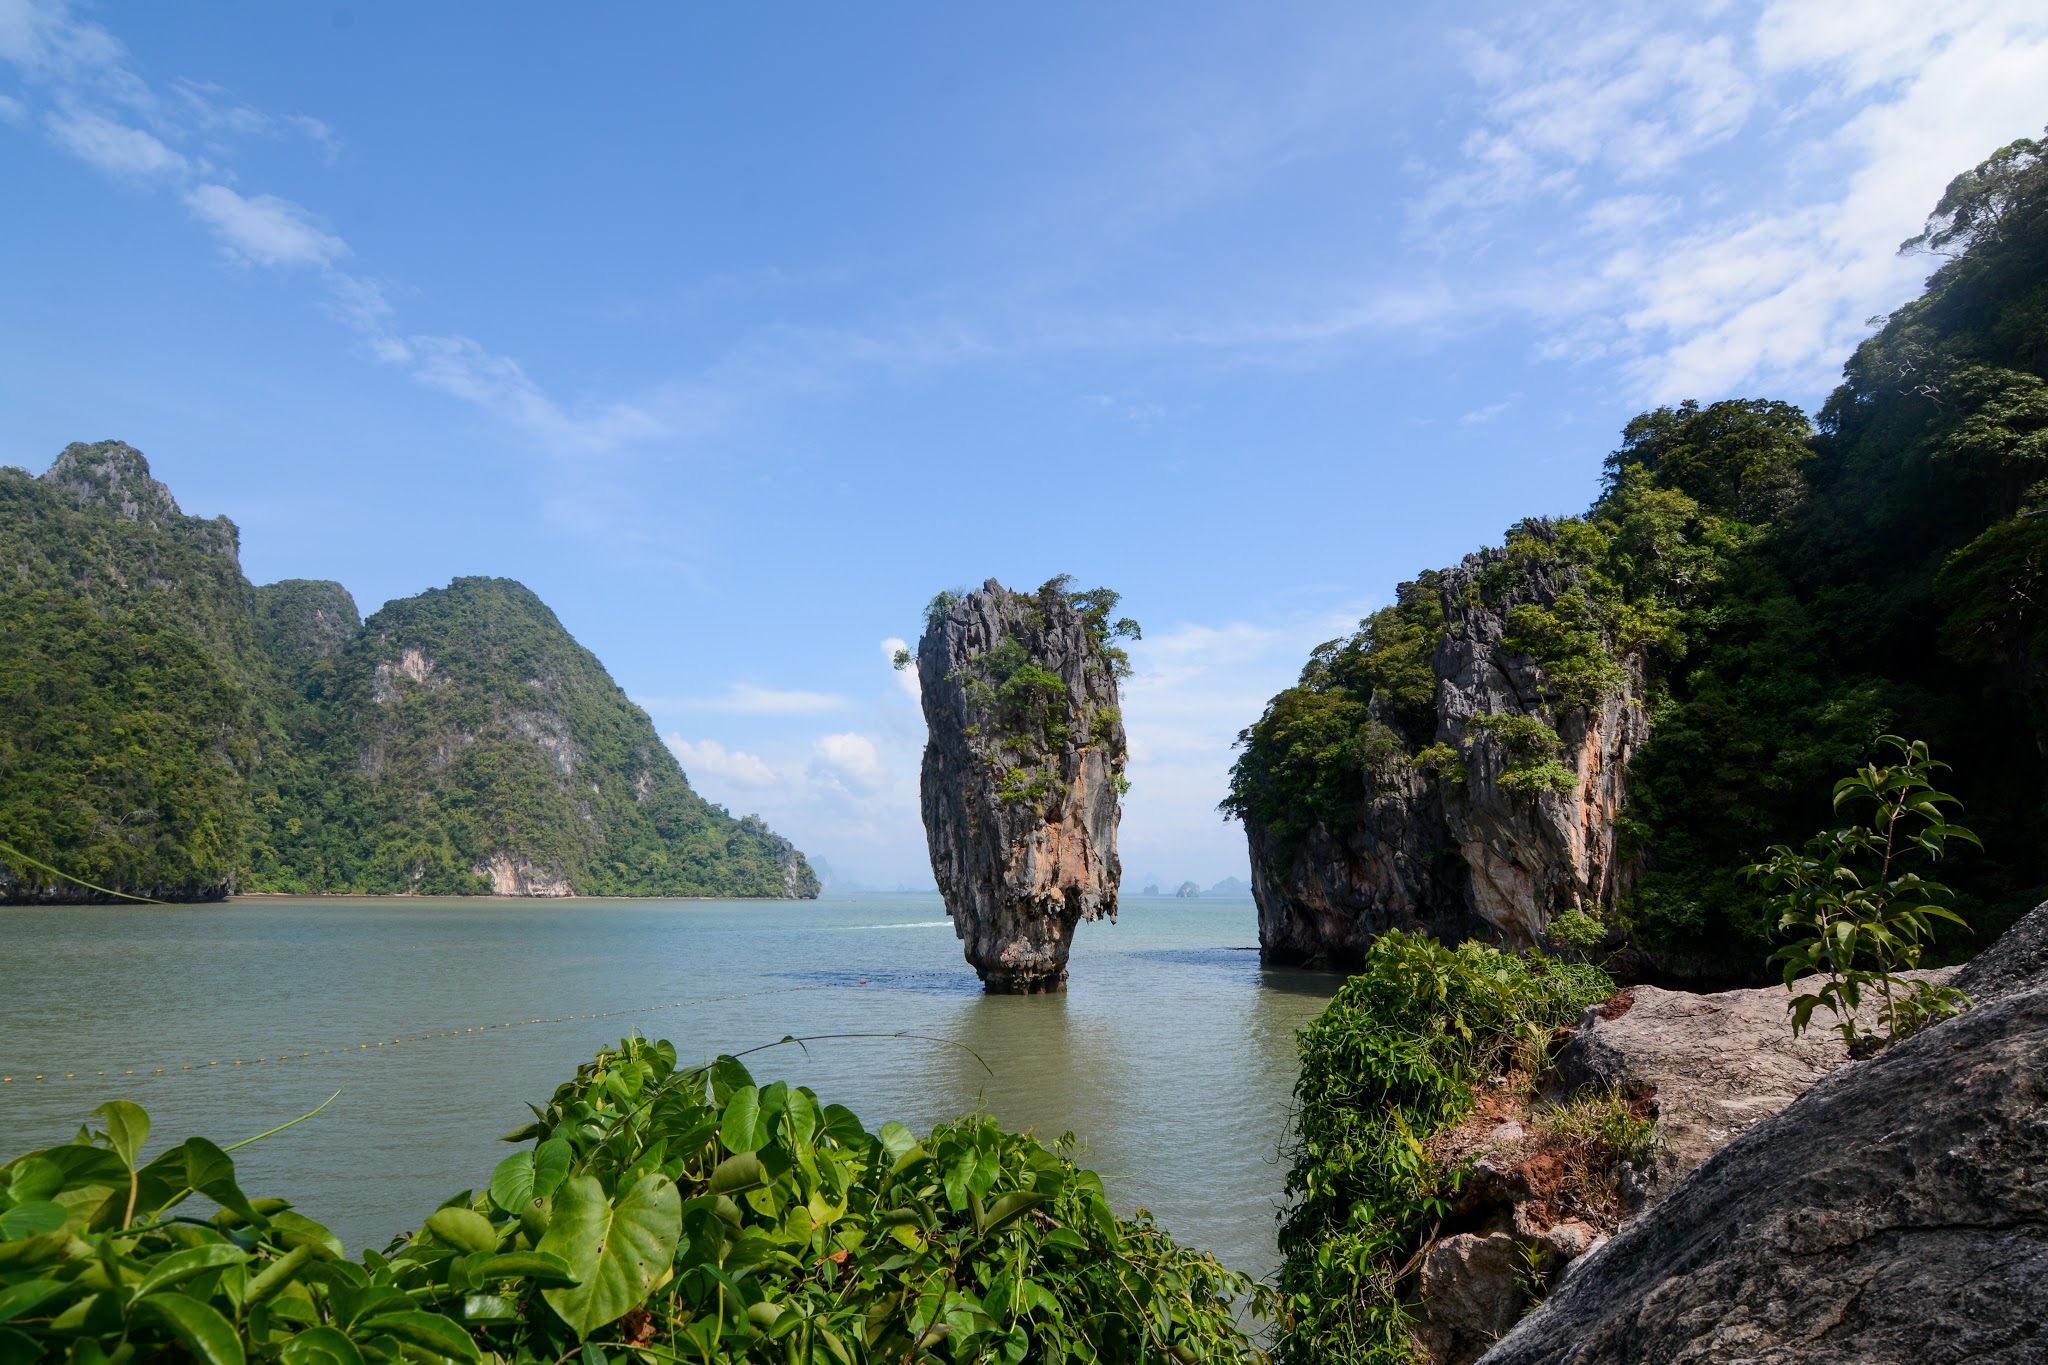 Залив Пханг-Нге